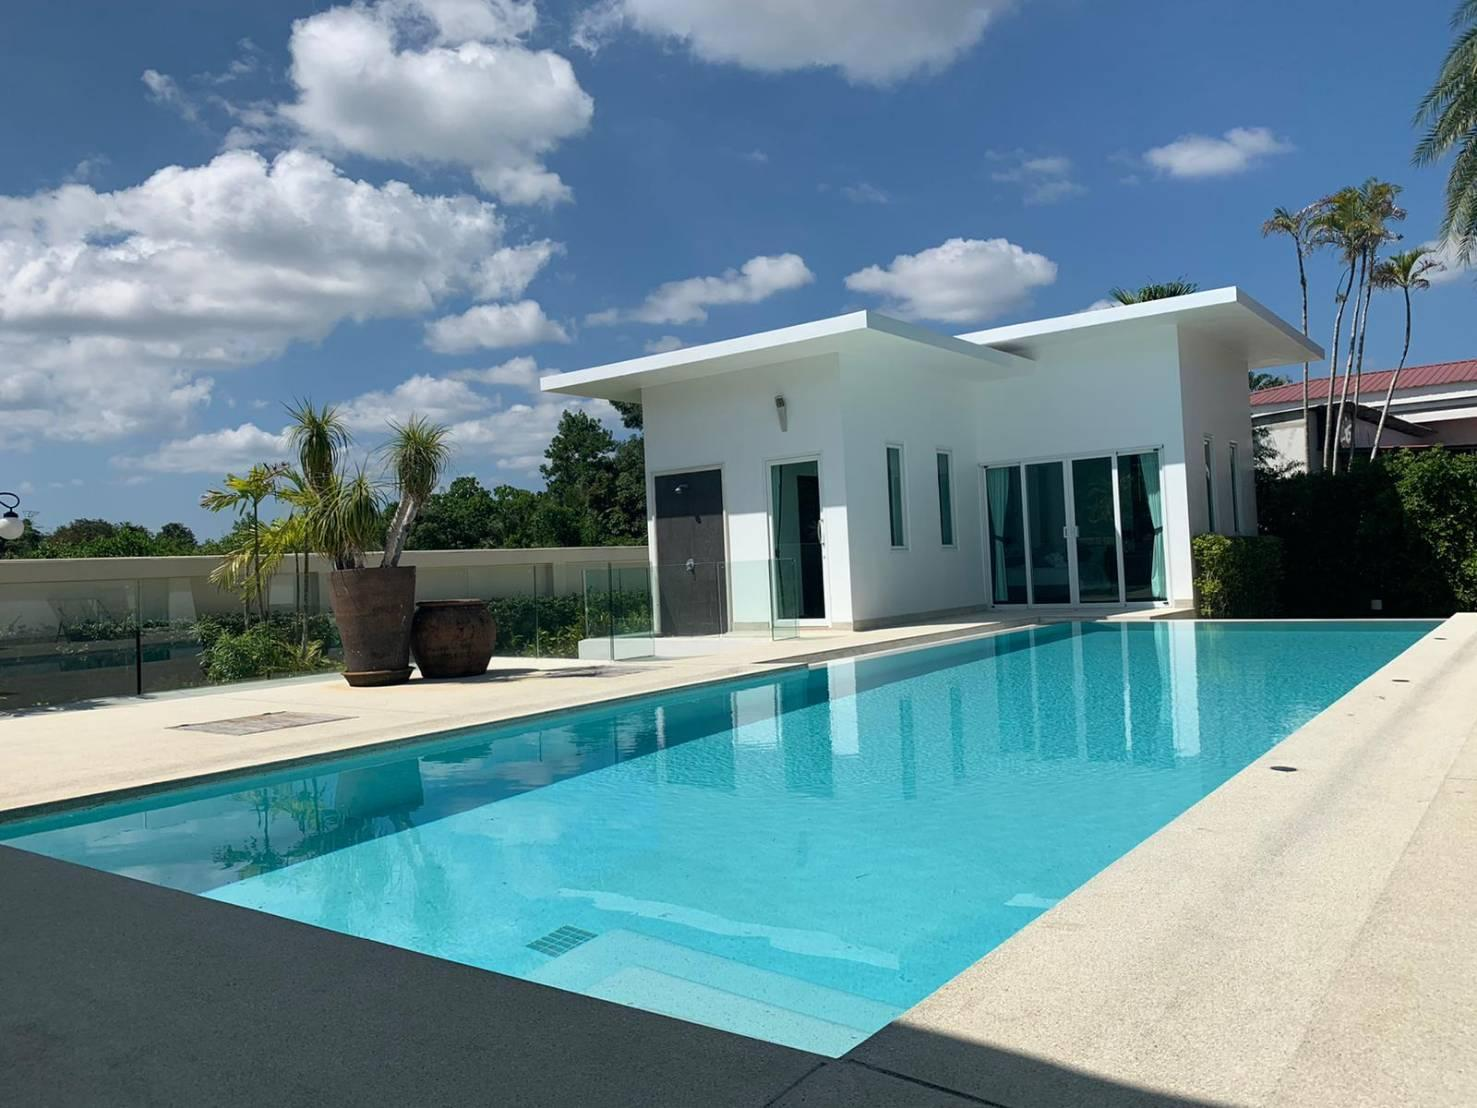 Lagoon Garden - 4 bedrooms luxury pool villa วิลลา 4 ห้องนอน 5 ห้องน้ำส่วนตัว ขนาด 400 ตร.ม. – ป่าคลอก